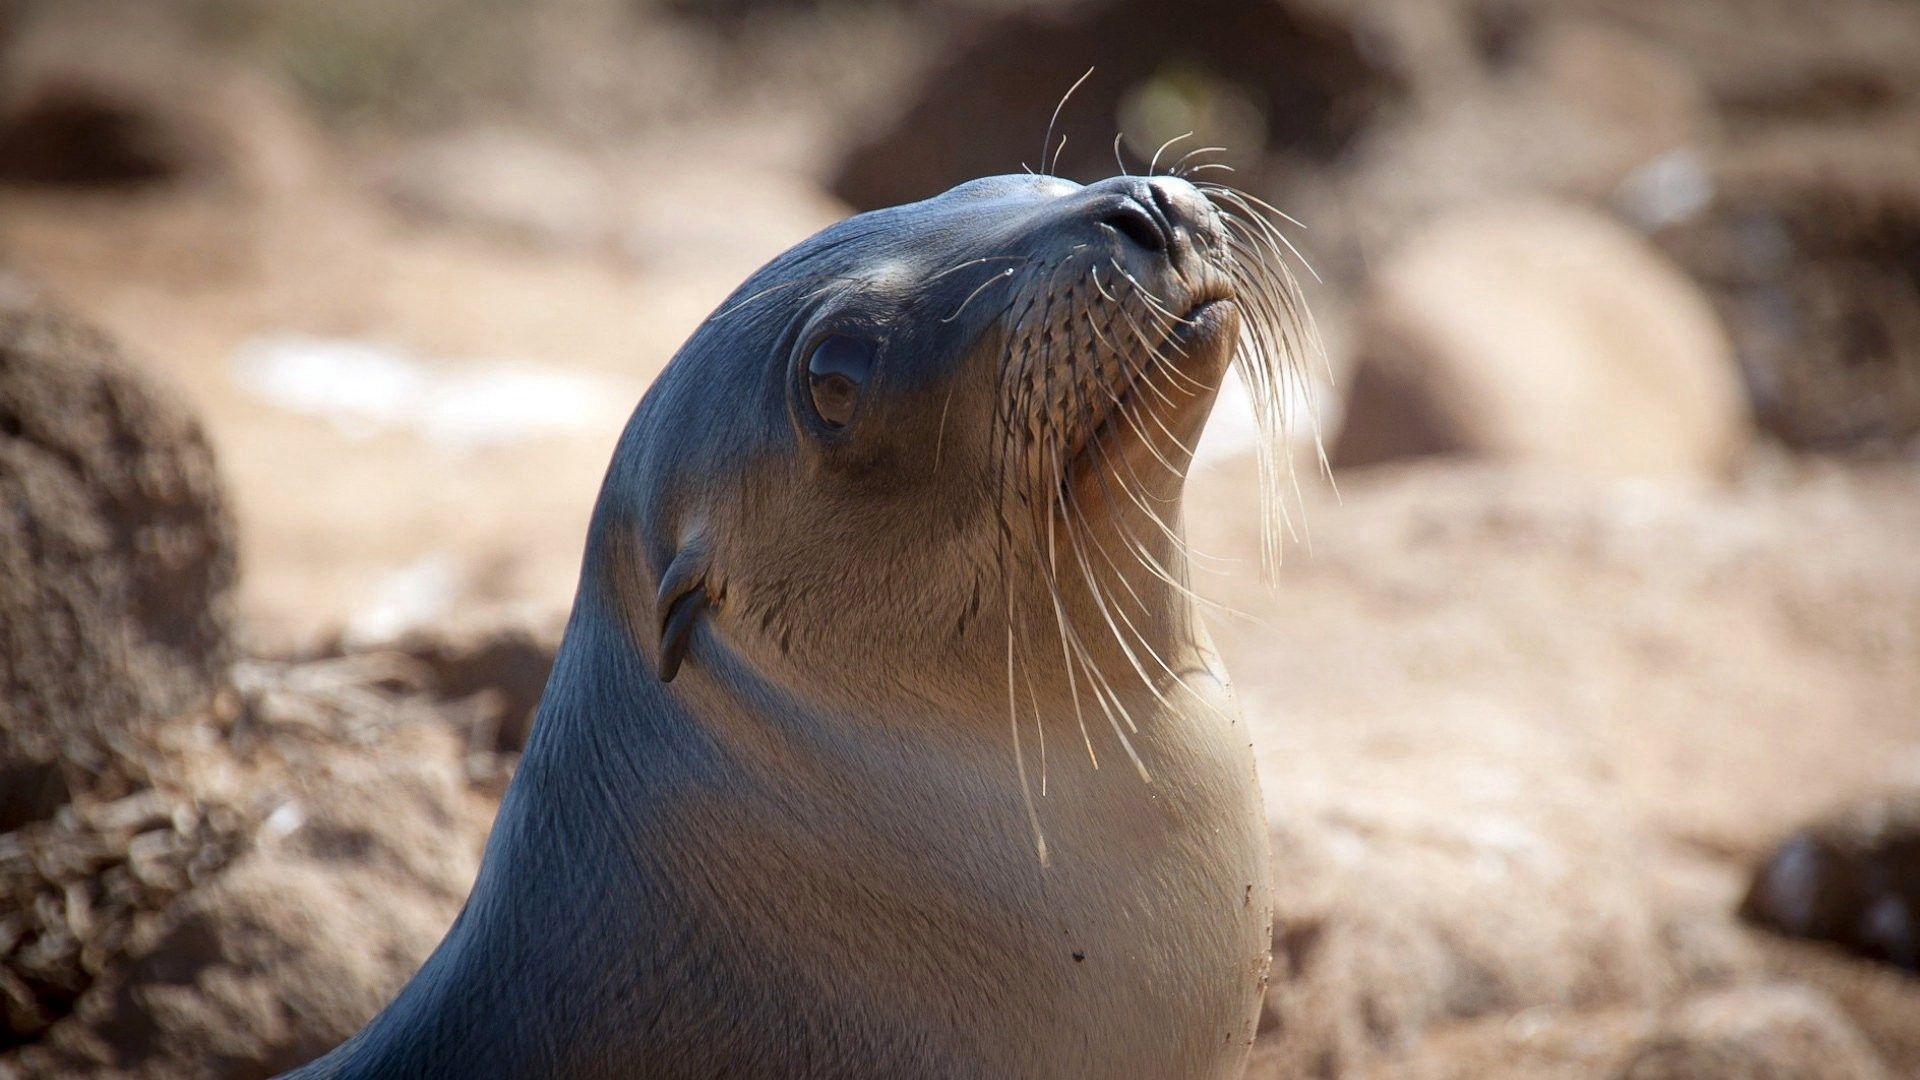 Fur Seal wallpaper photo hd